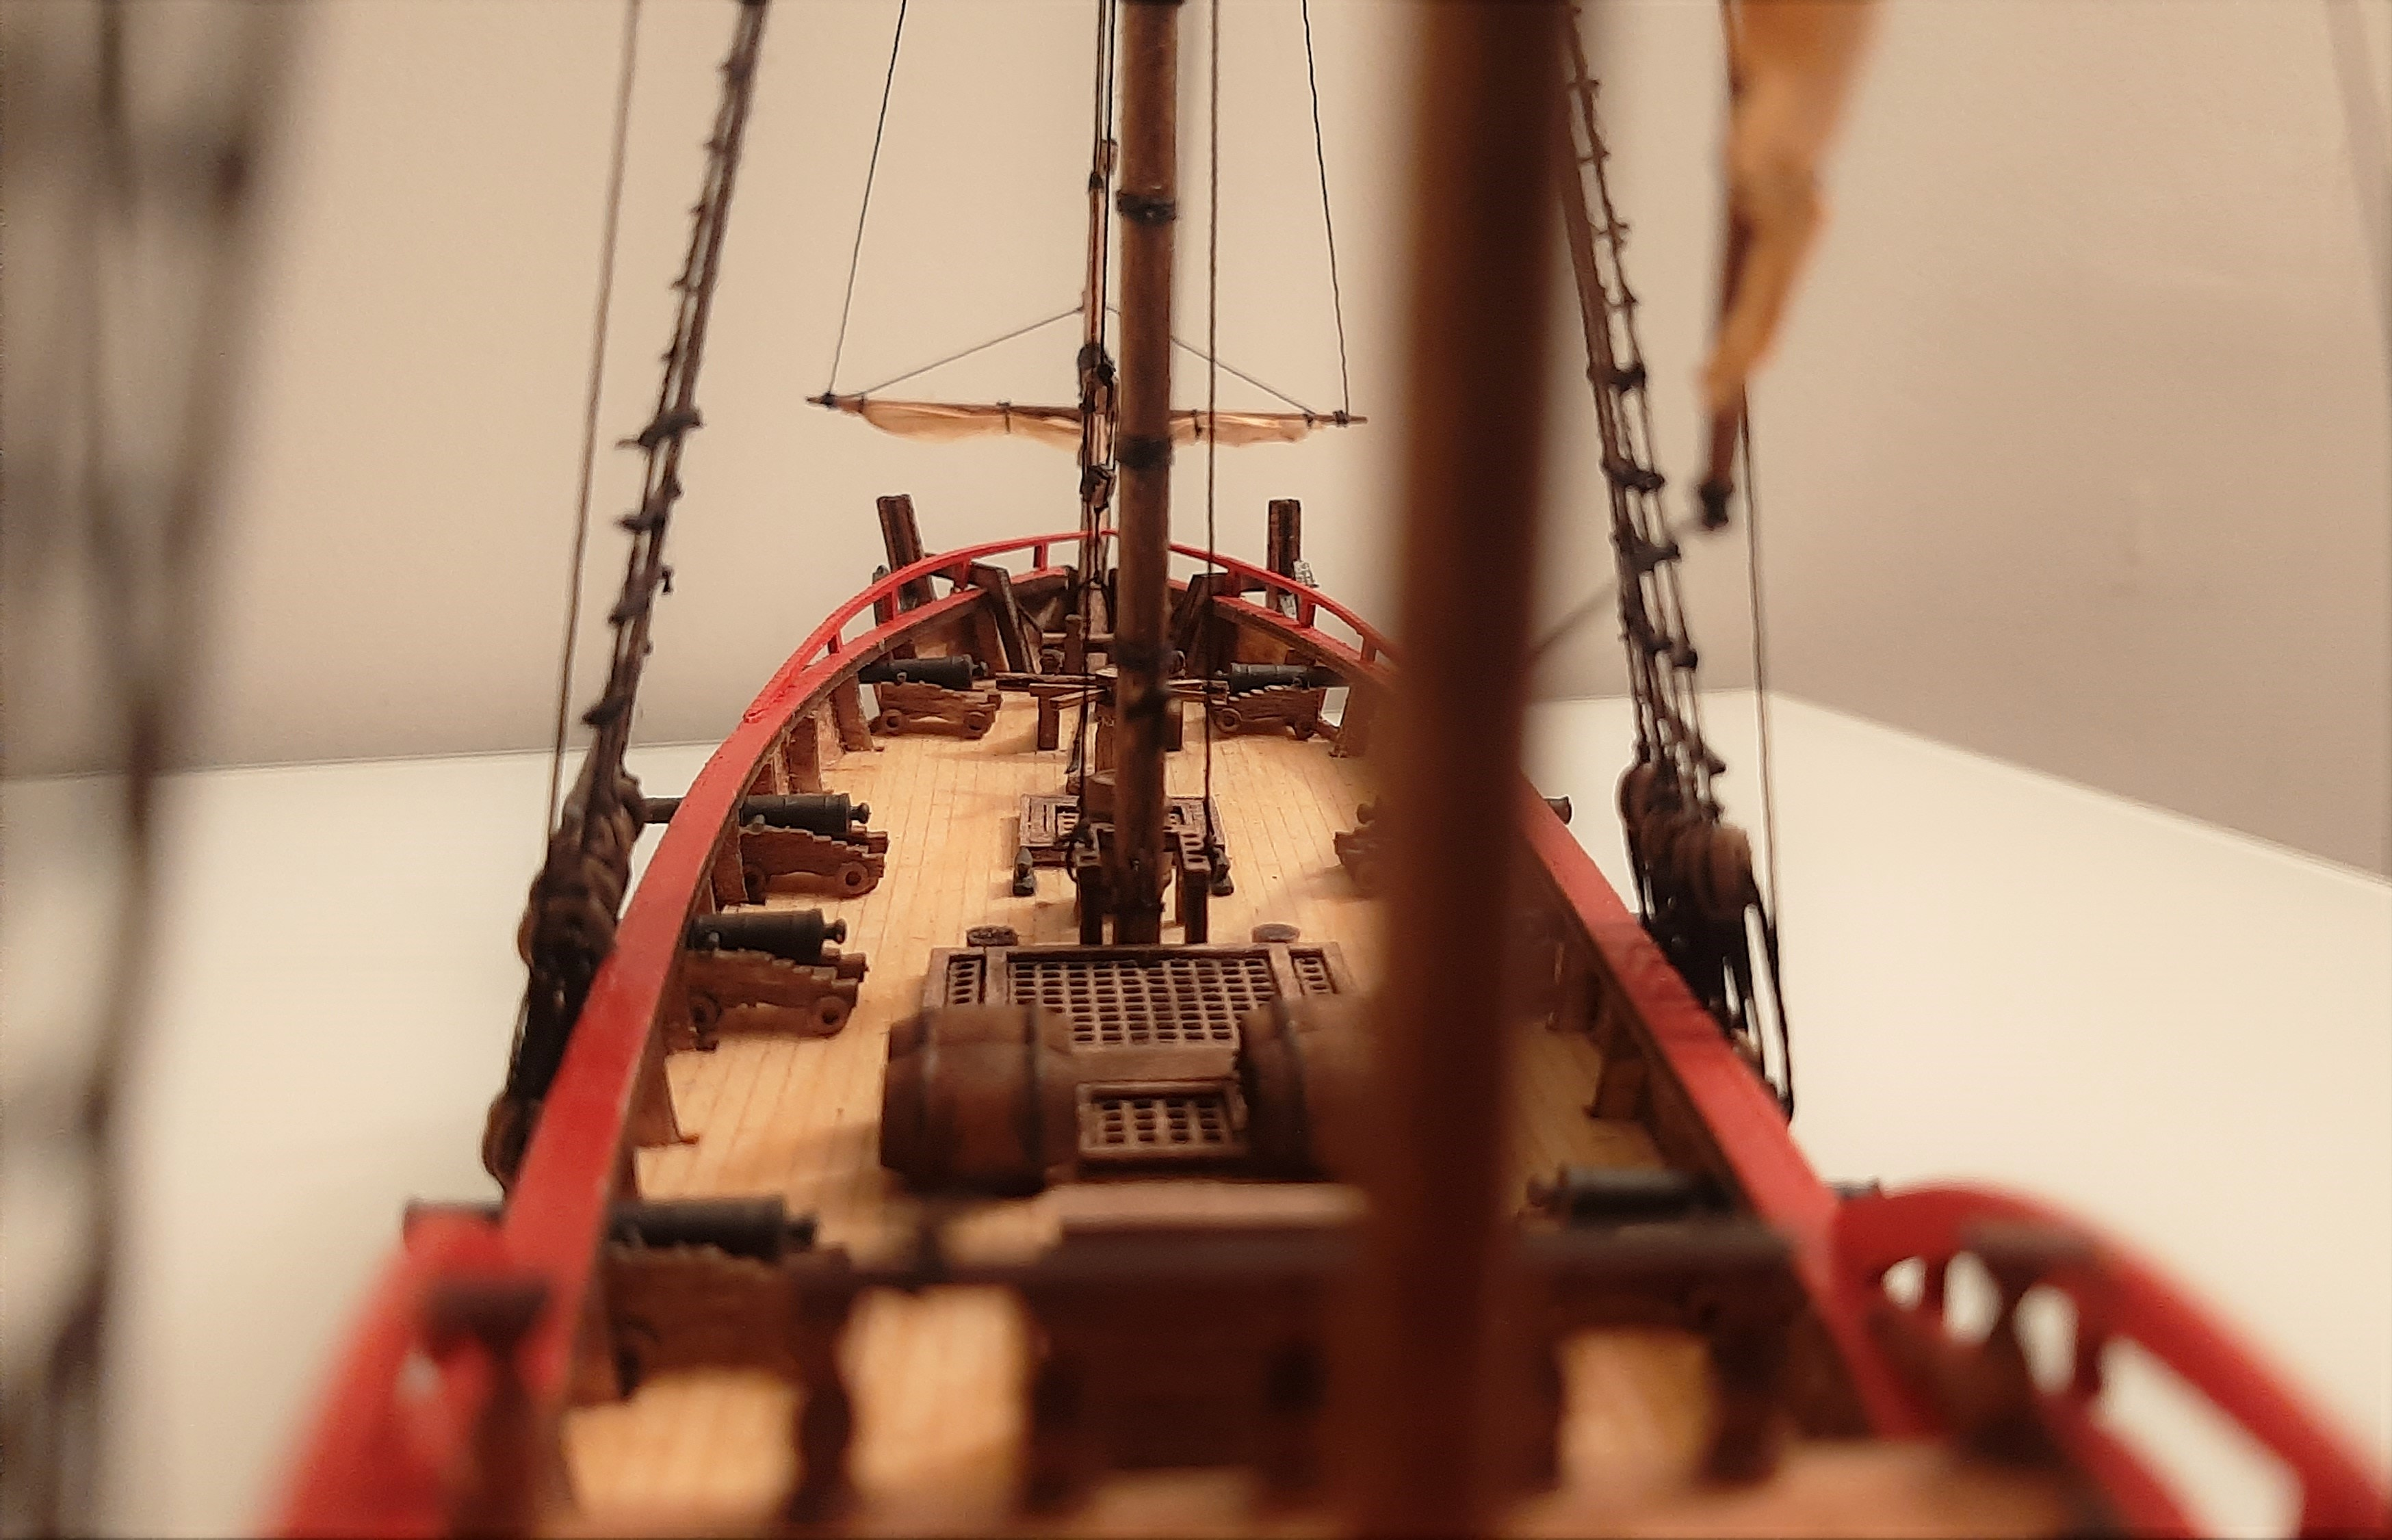 Galiote du pirate Rackham Le Rouge 1/100 (Tintin - le secret de la licorne) USRO5Uvpb